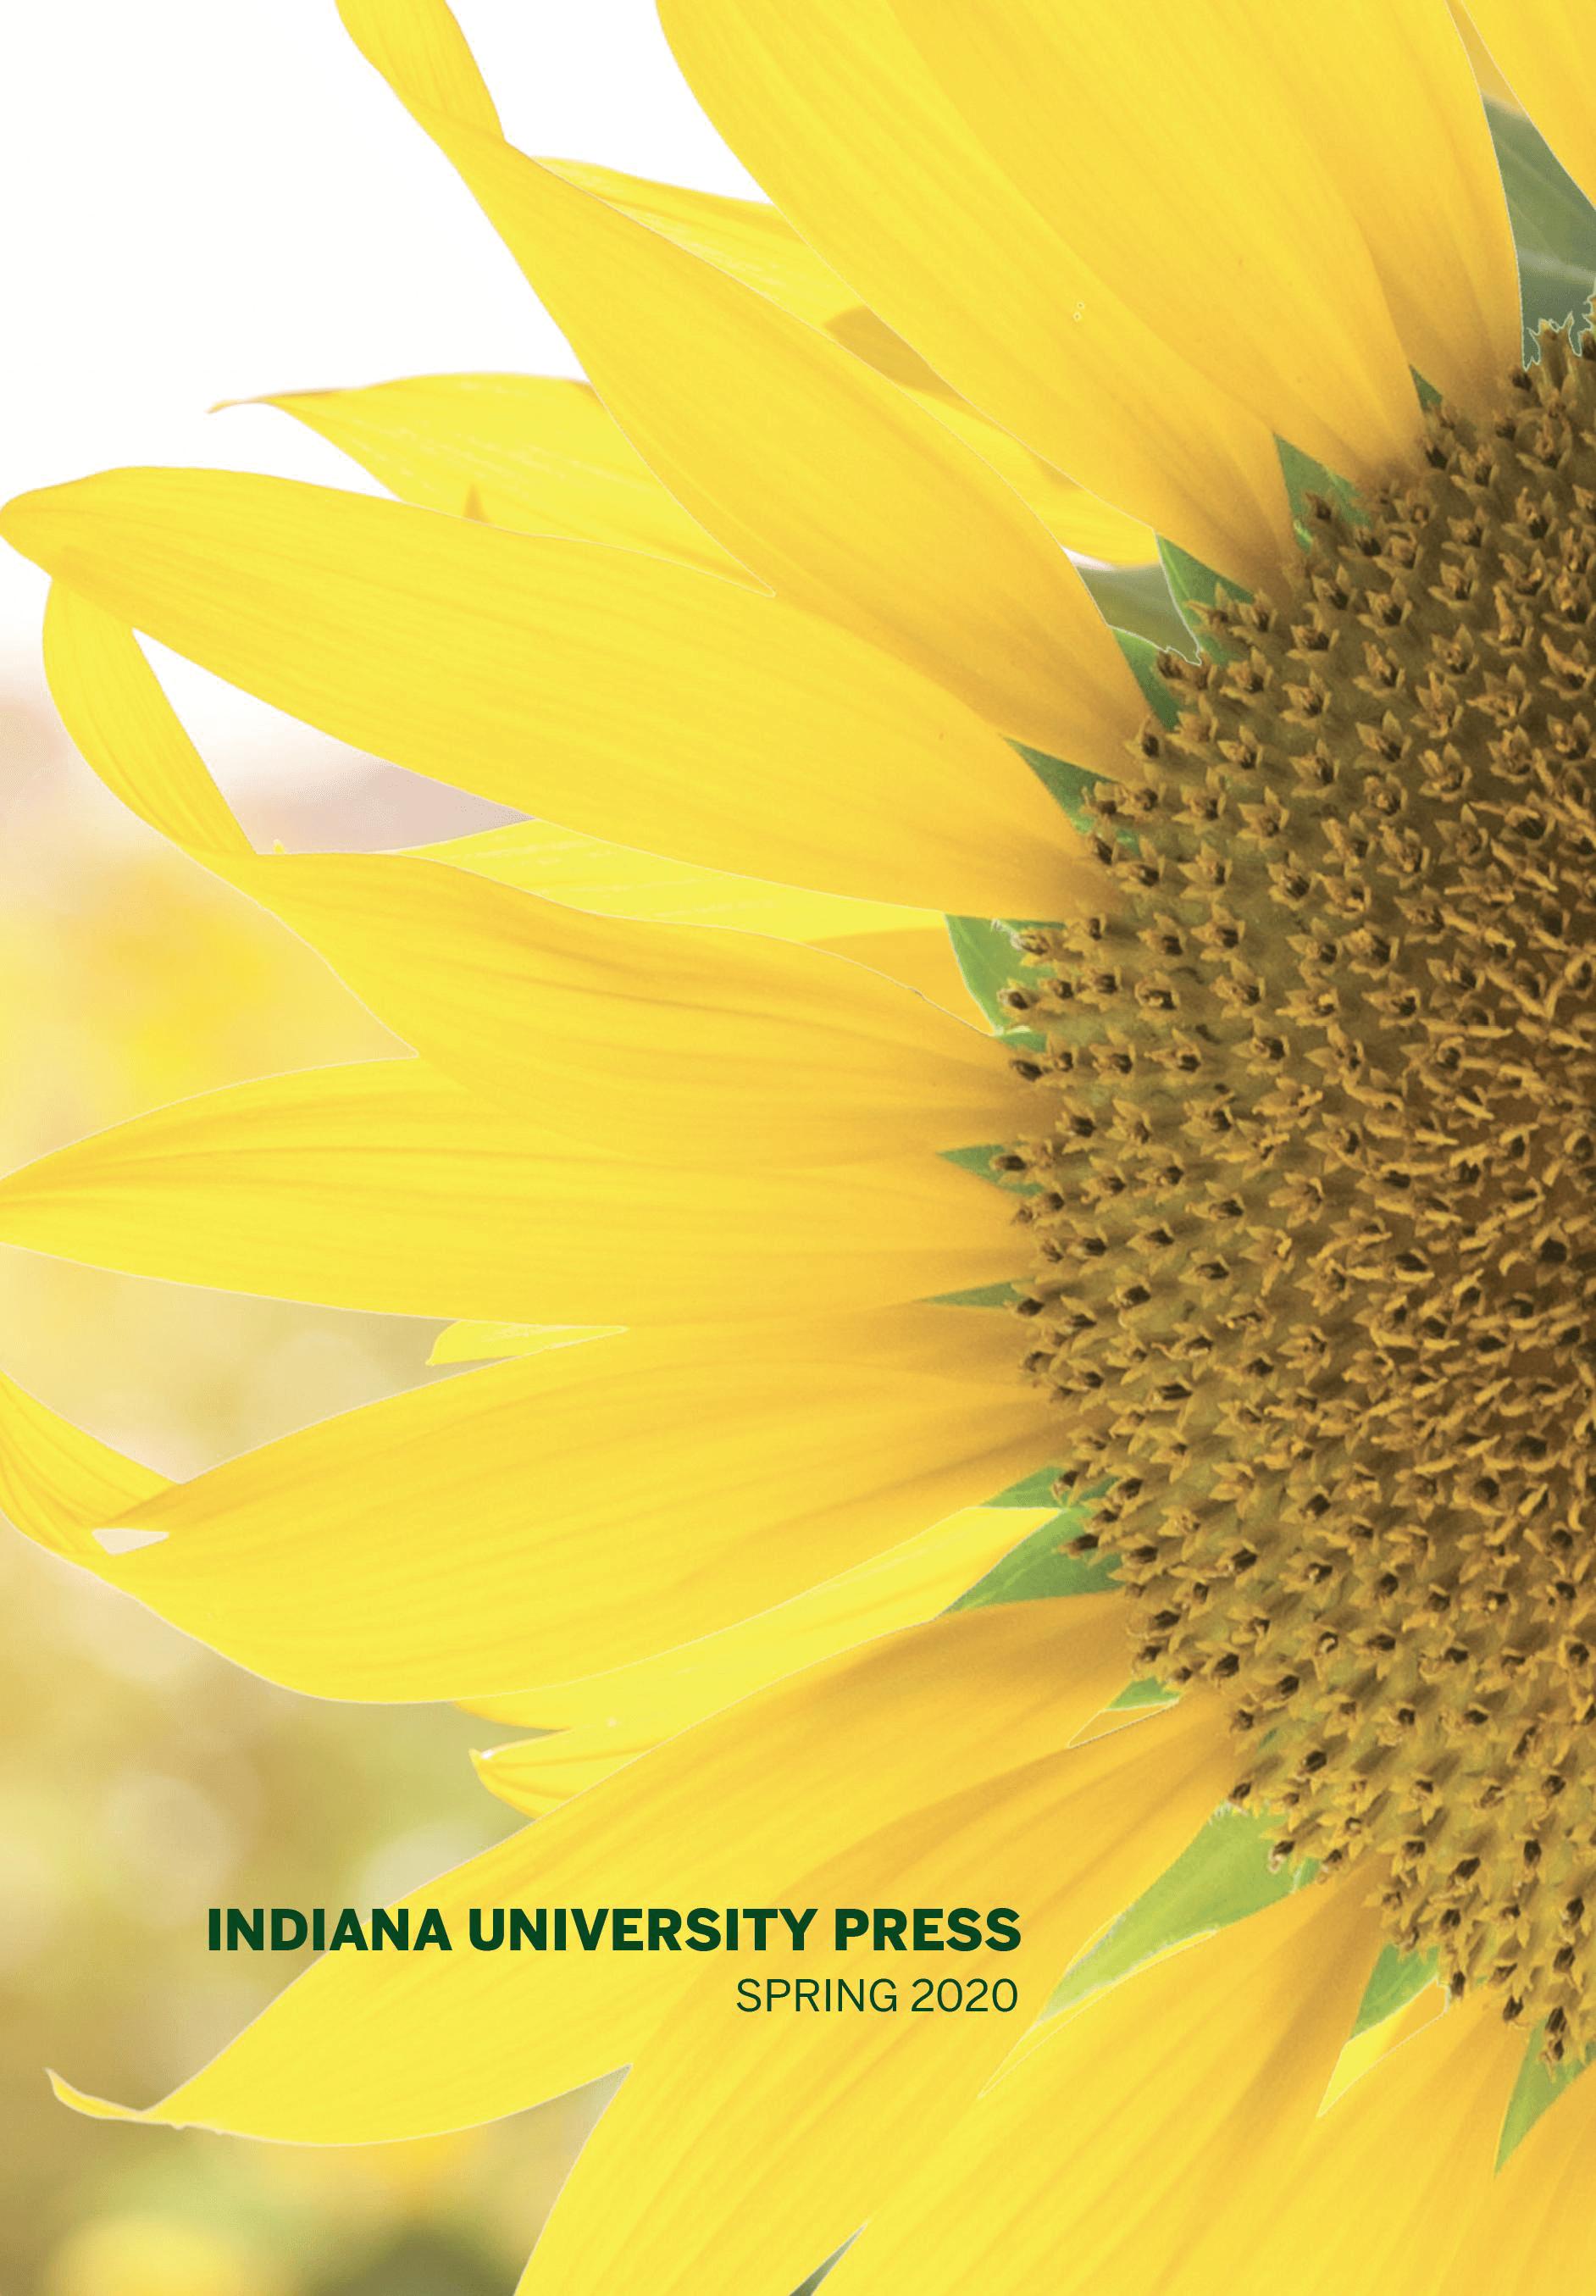 Indiana University Press Spring 2020 Catalog